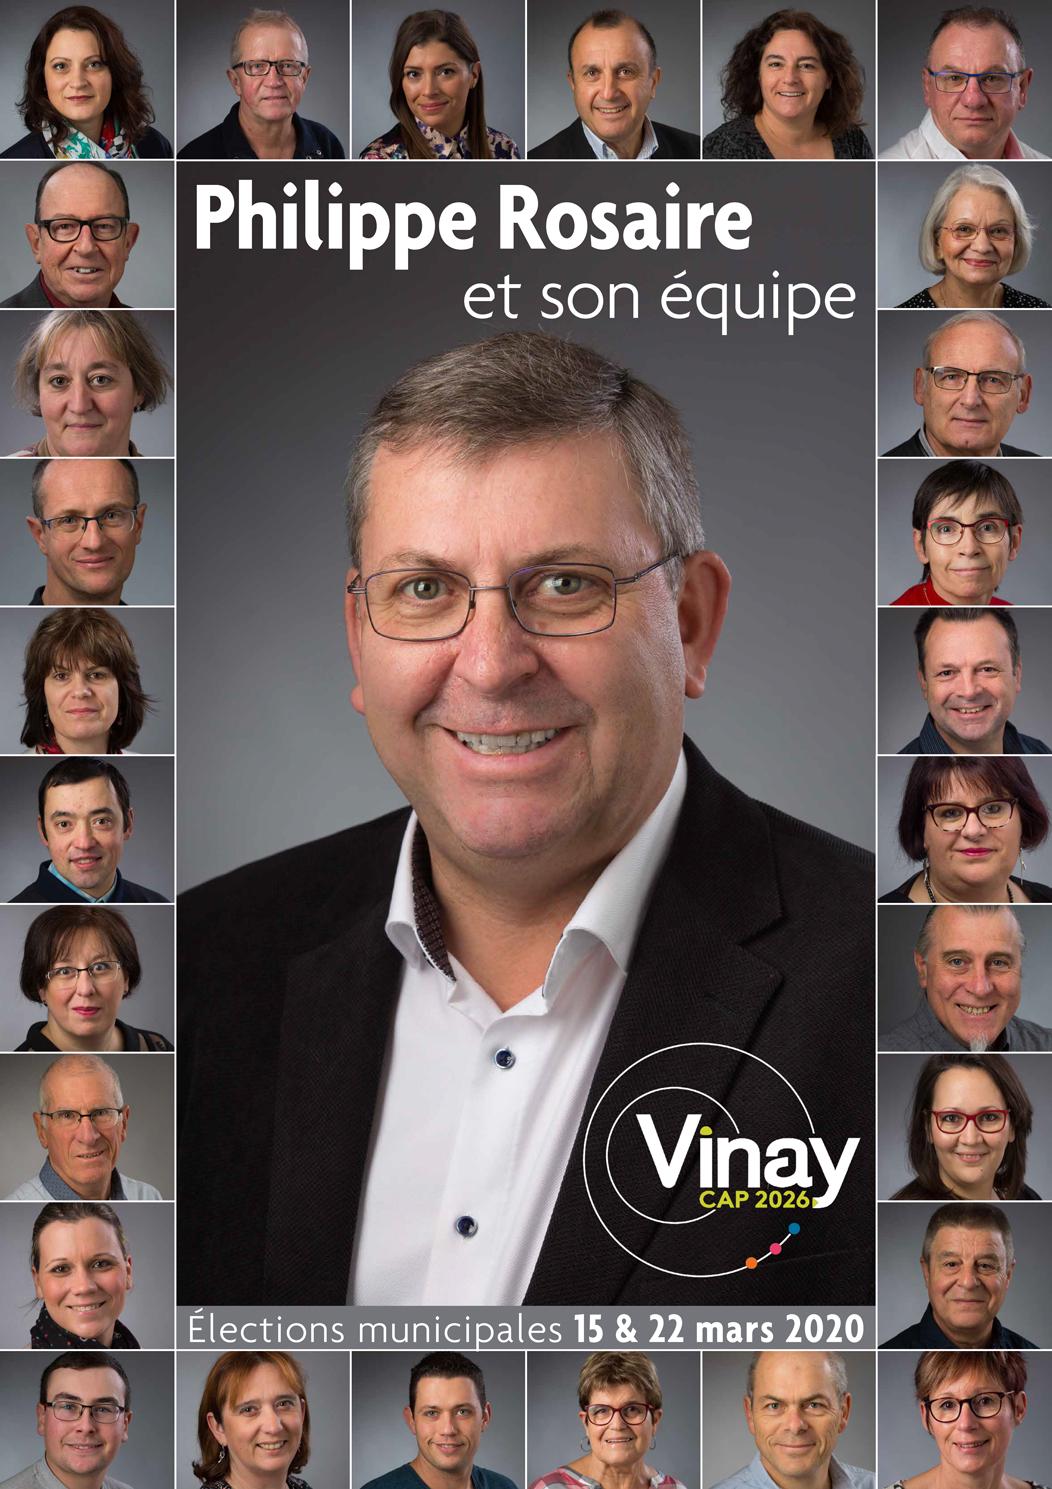 Vinay_affiche1